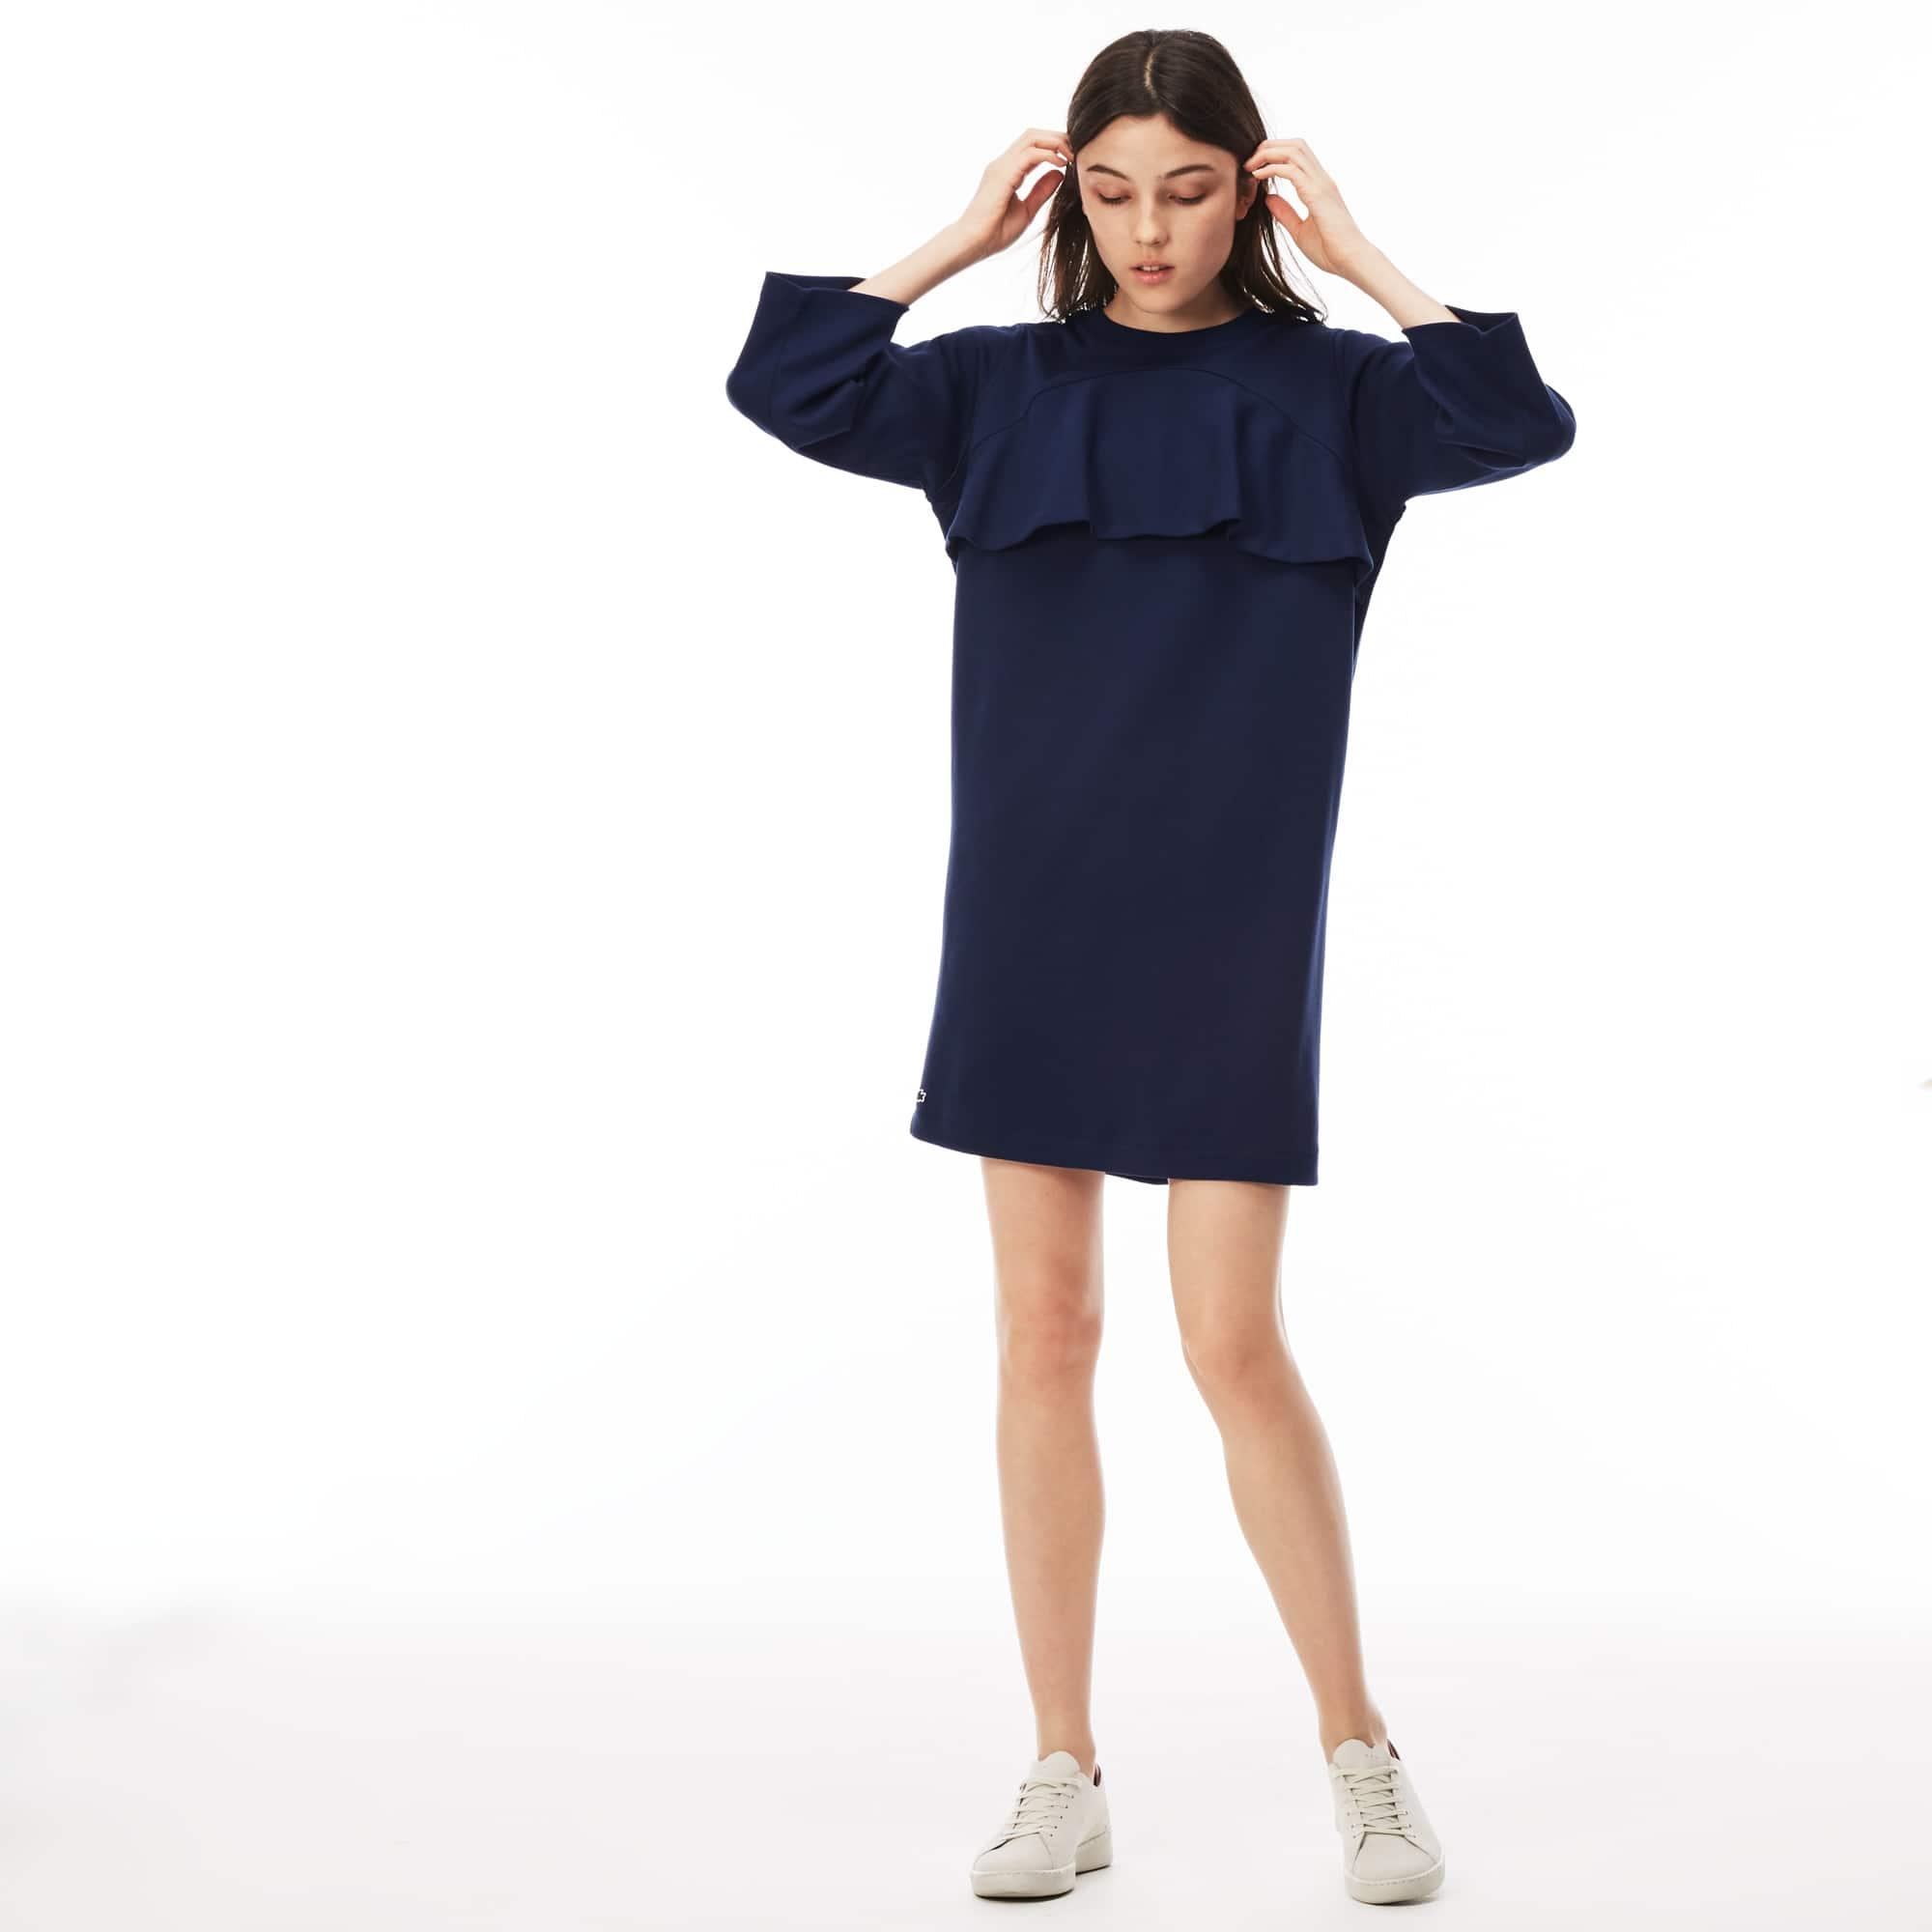 Lacoste LIVE-sweatshirtjurk dames interlock met ruches